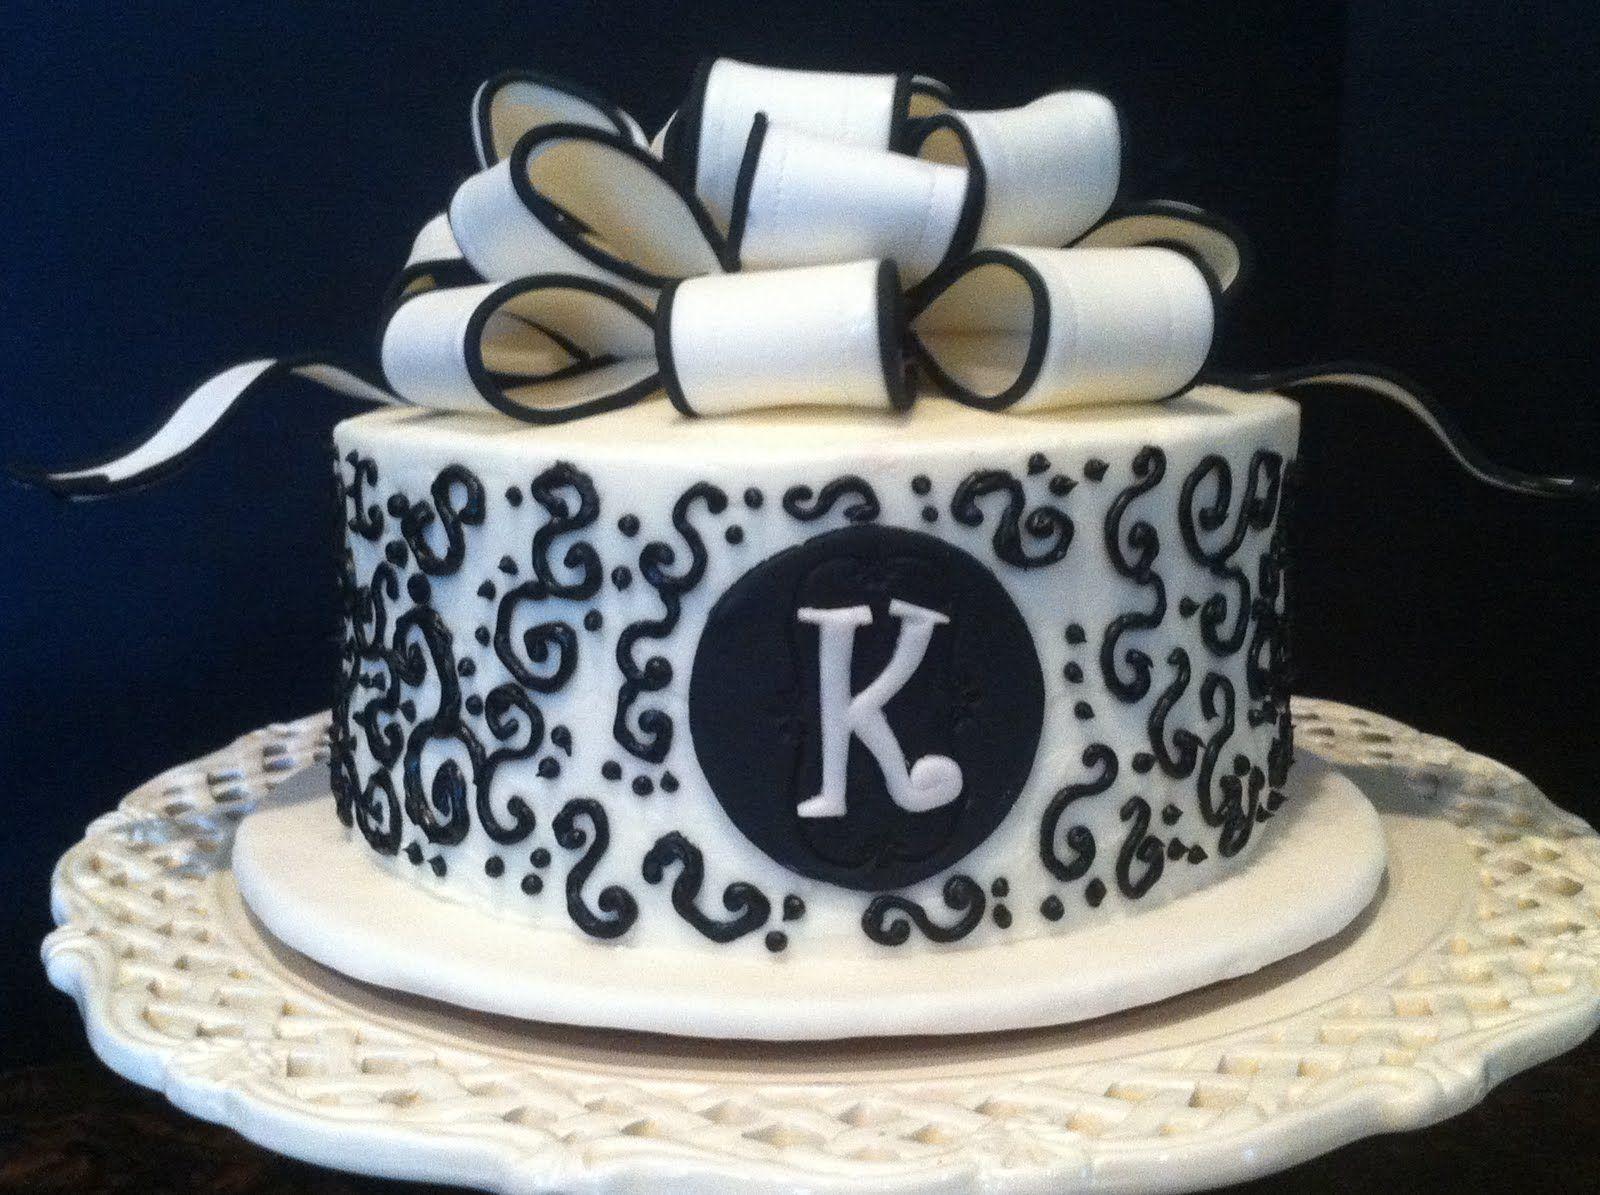 Small single tier black and white wedding cake design wedding